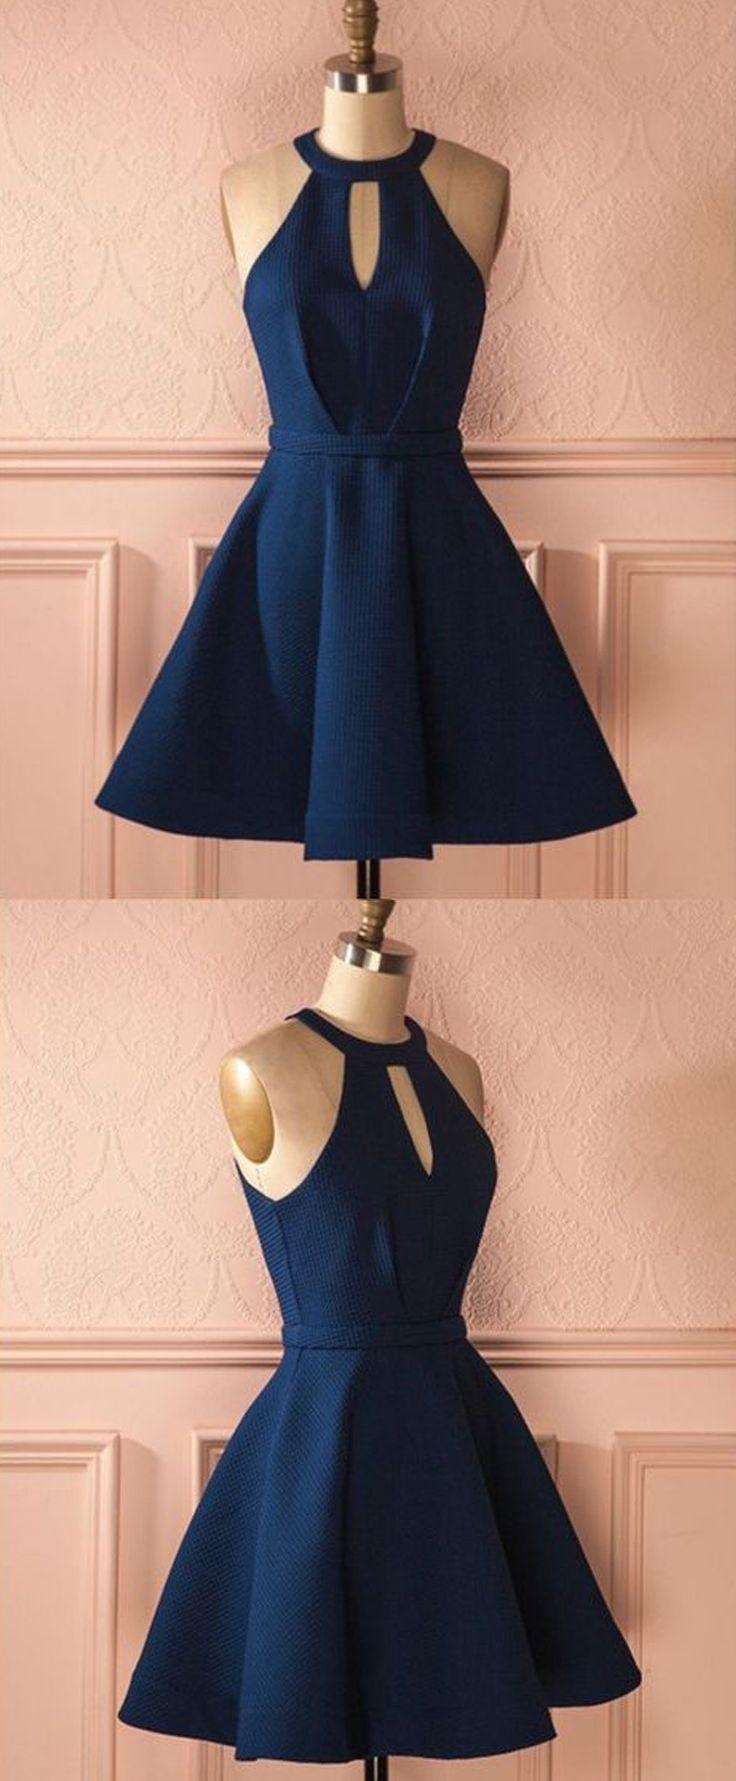 » Cute A Line Halter Navy Blue Short Dress, Elastic Satin Navy Short Homecoming Dress with Pocket Under 100 HD0711003